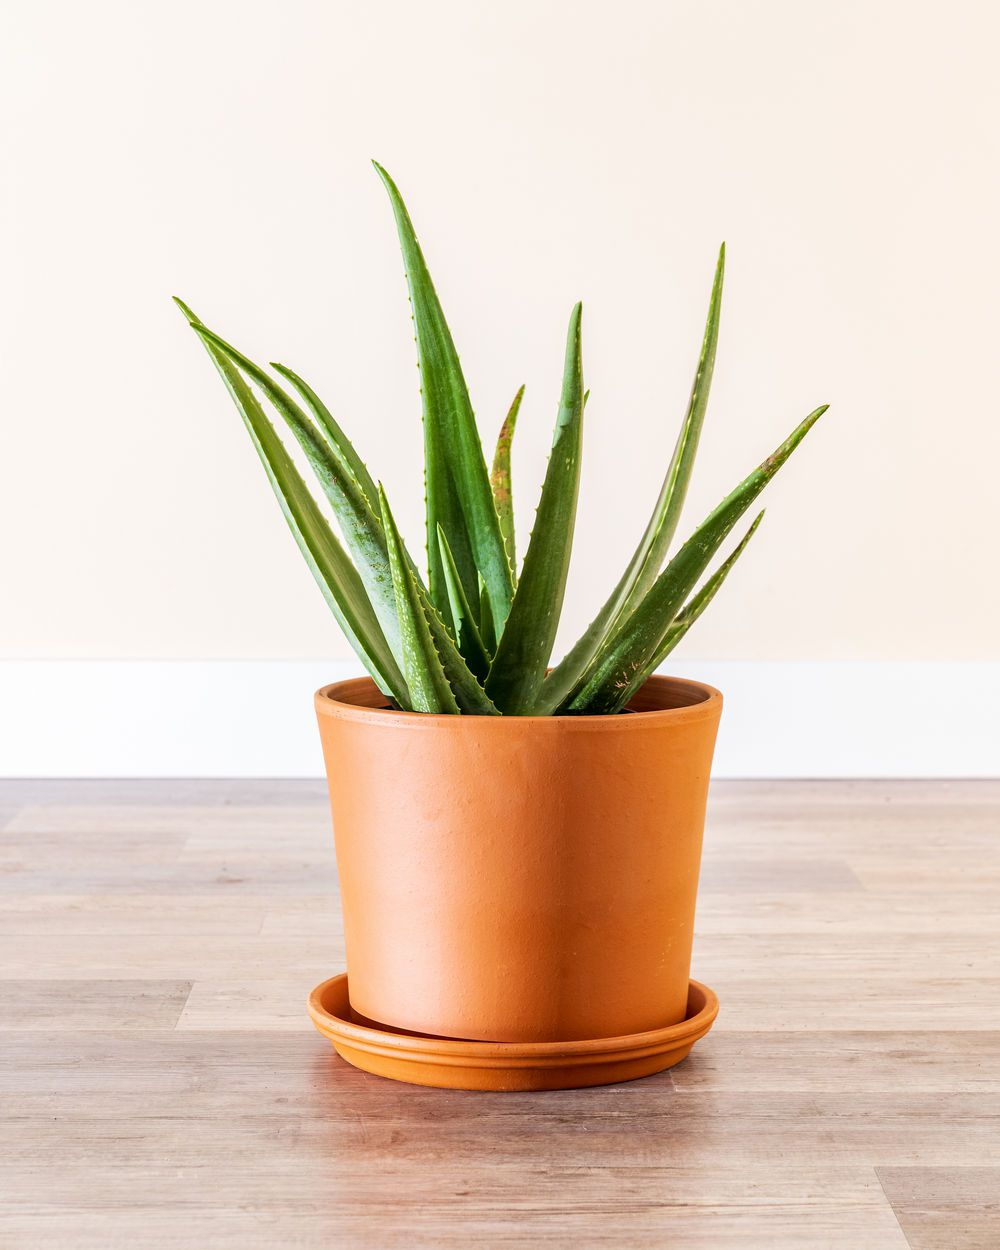 Aloe Vera plant in terra cotta pot